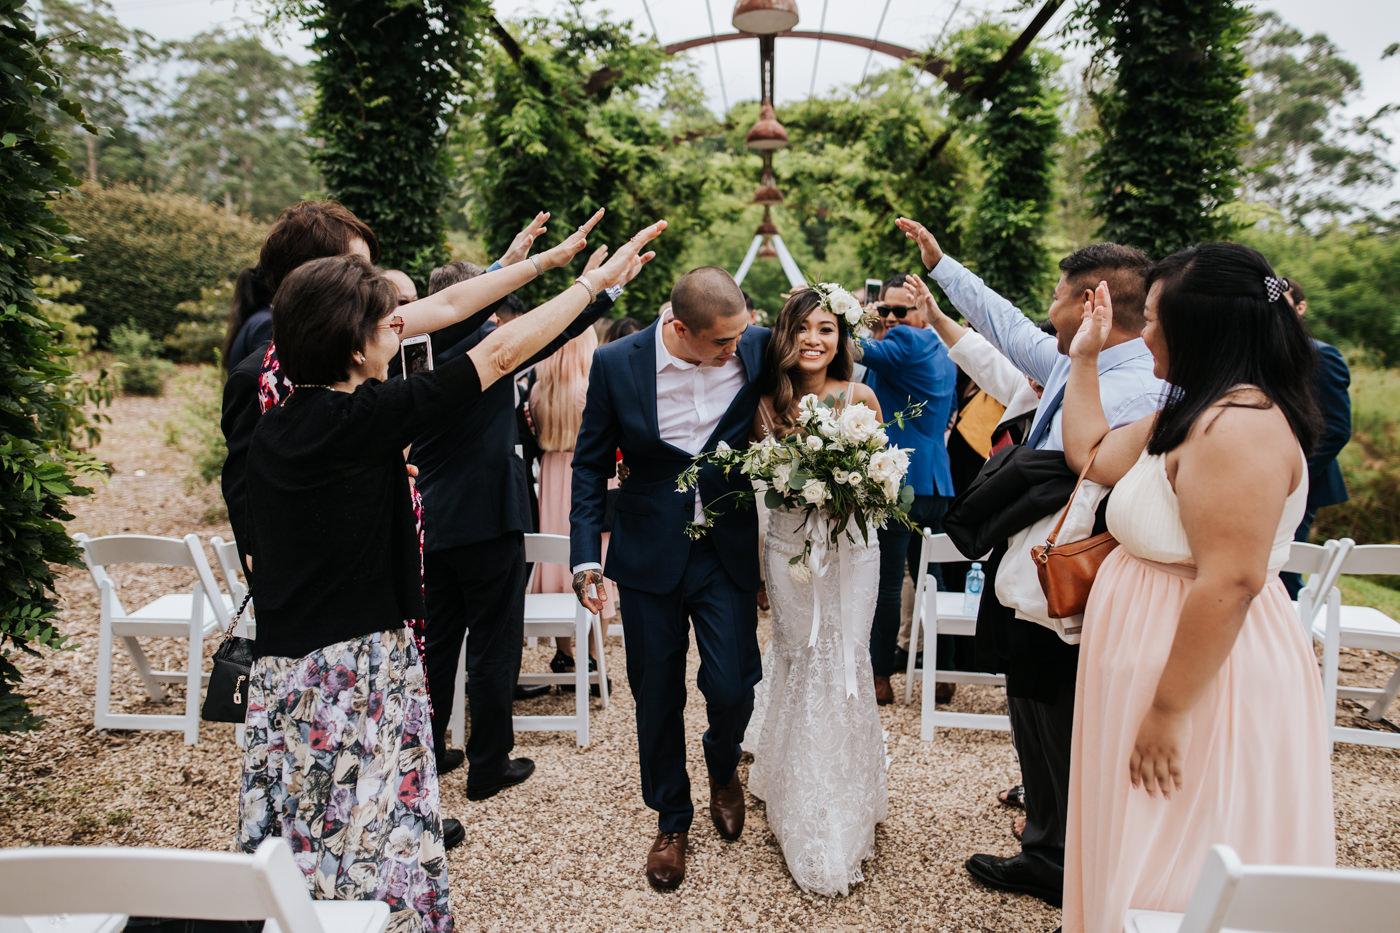 Nick & Vanezza - Fernbank Farm Wedding - Samantha Heather Photography-84.jpg